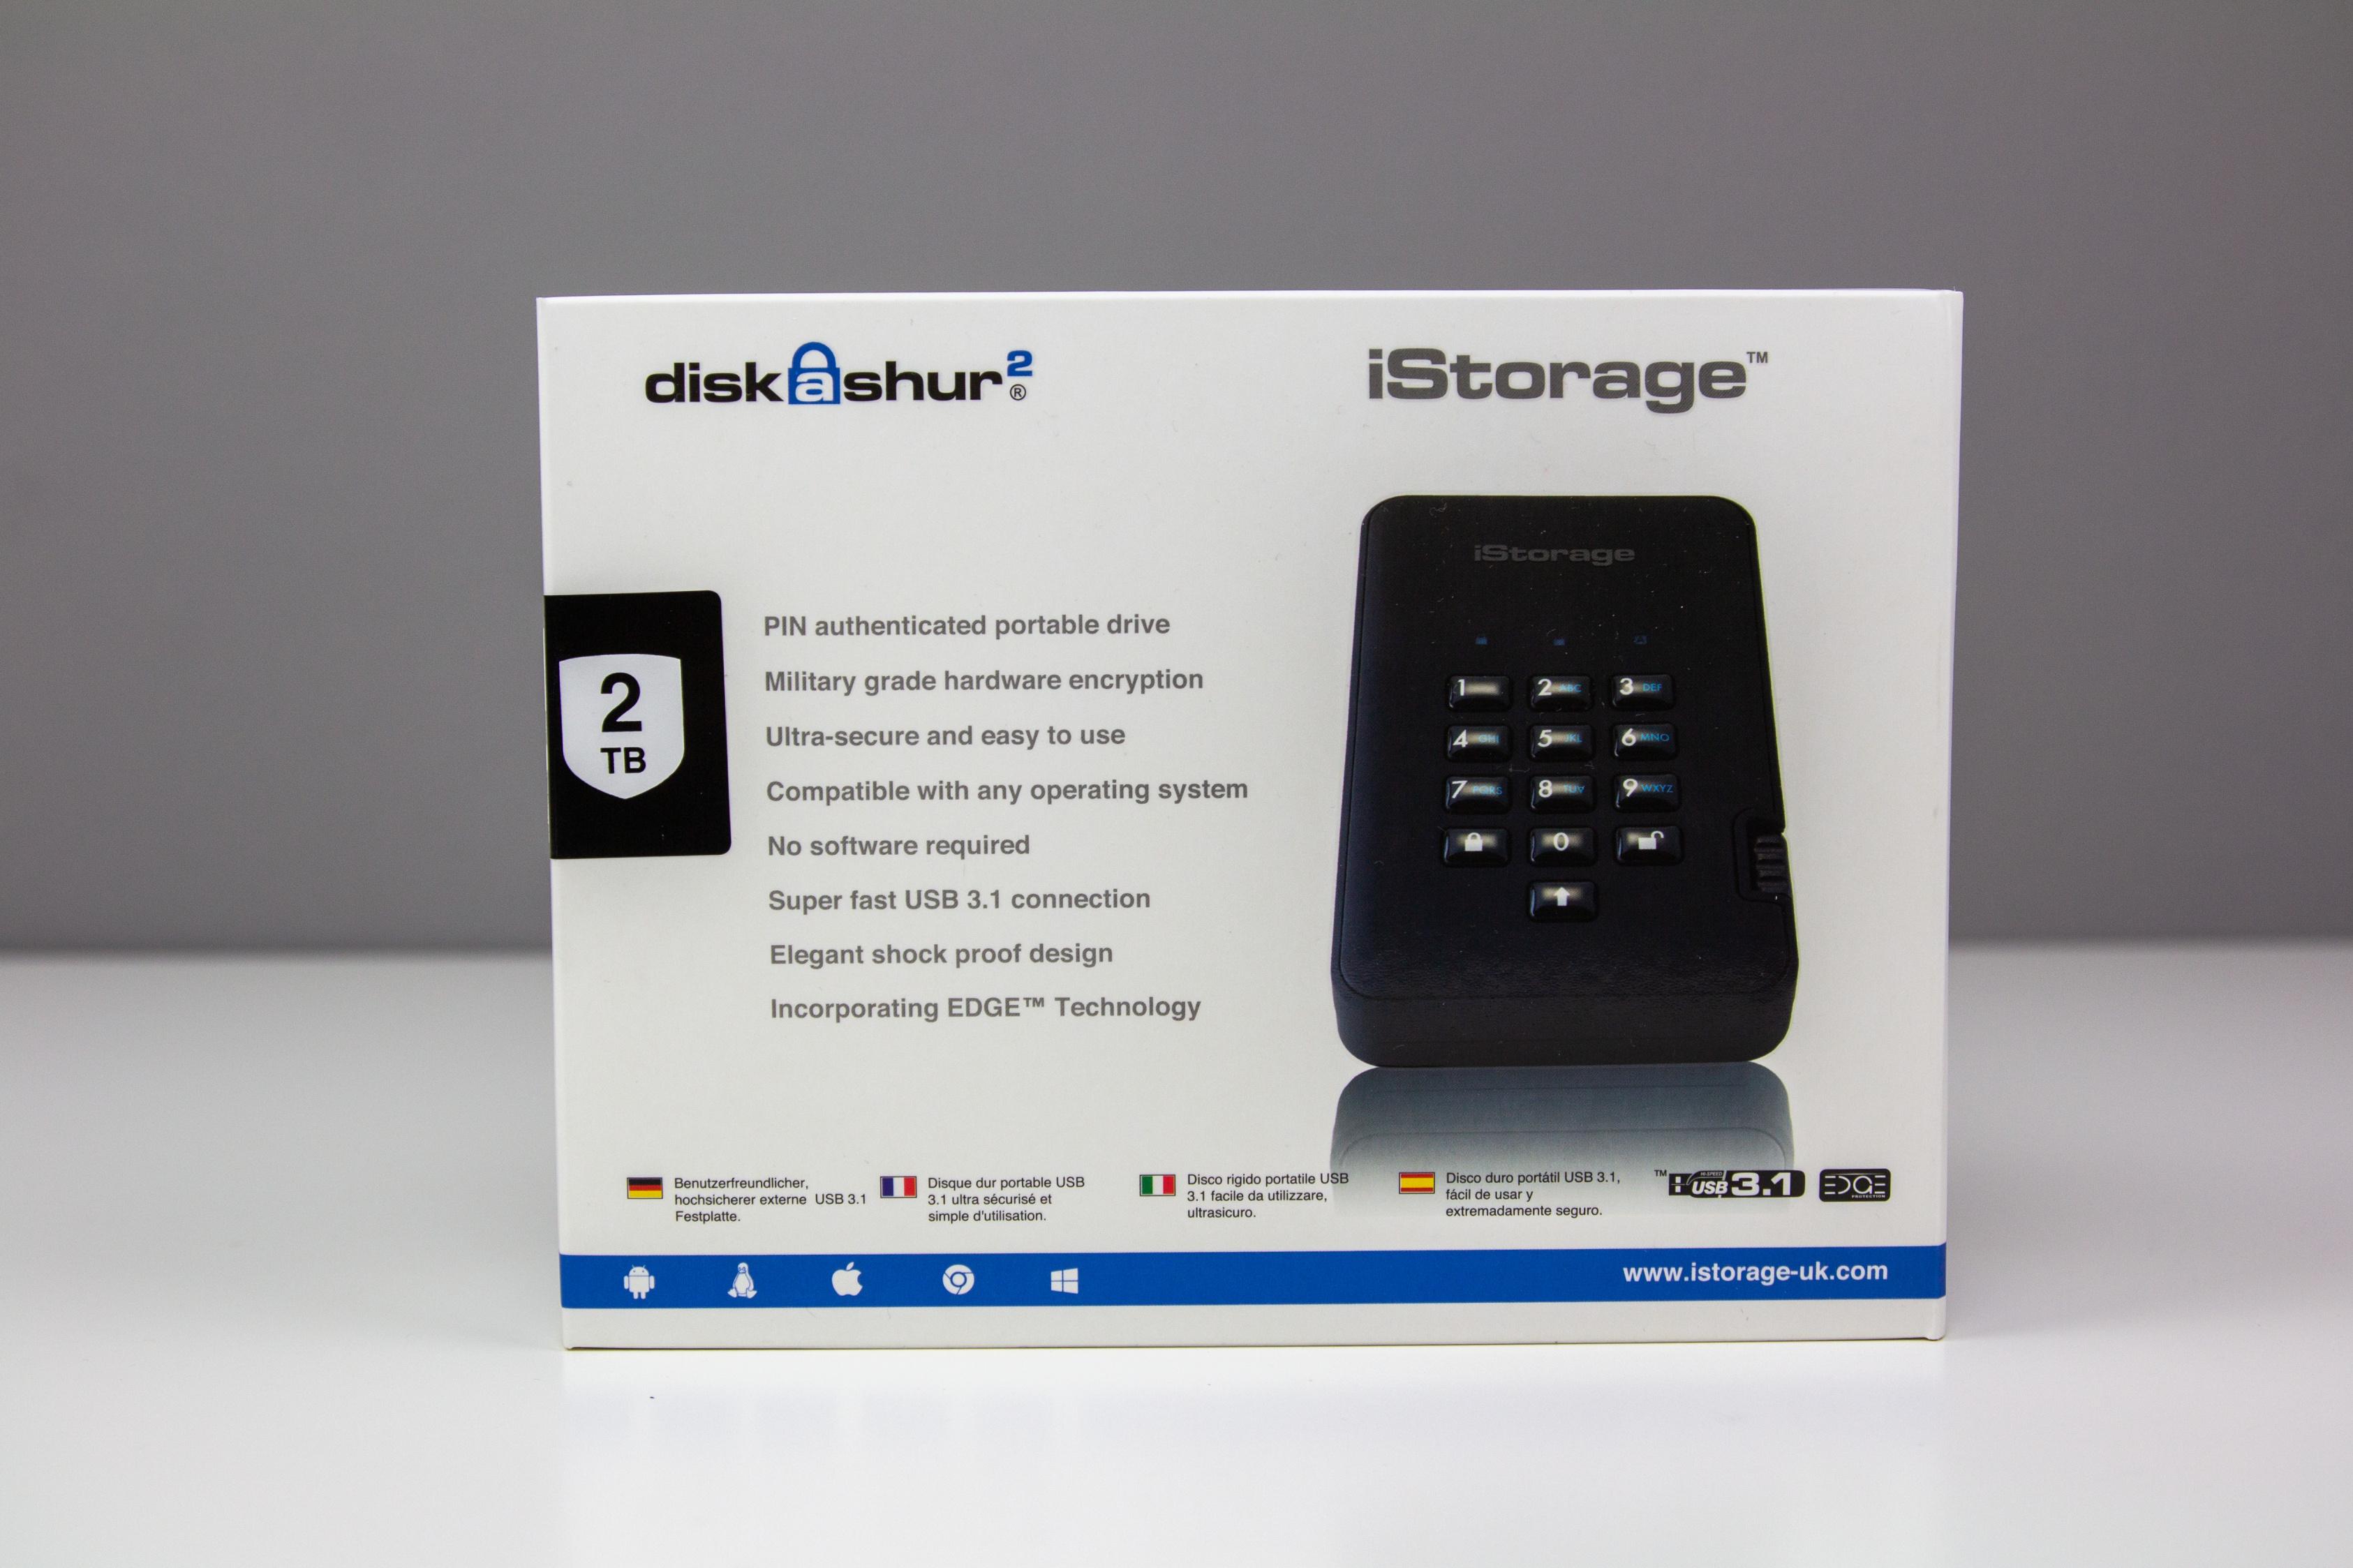 Test] iStorage diskAshur2 HDD (2TB)